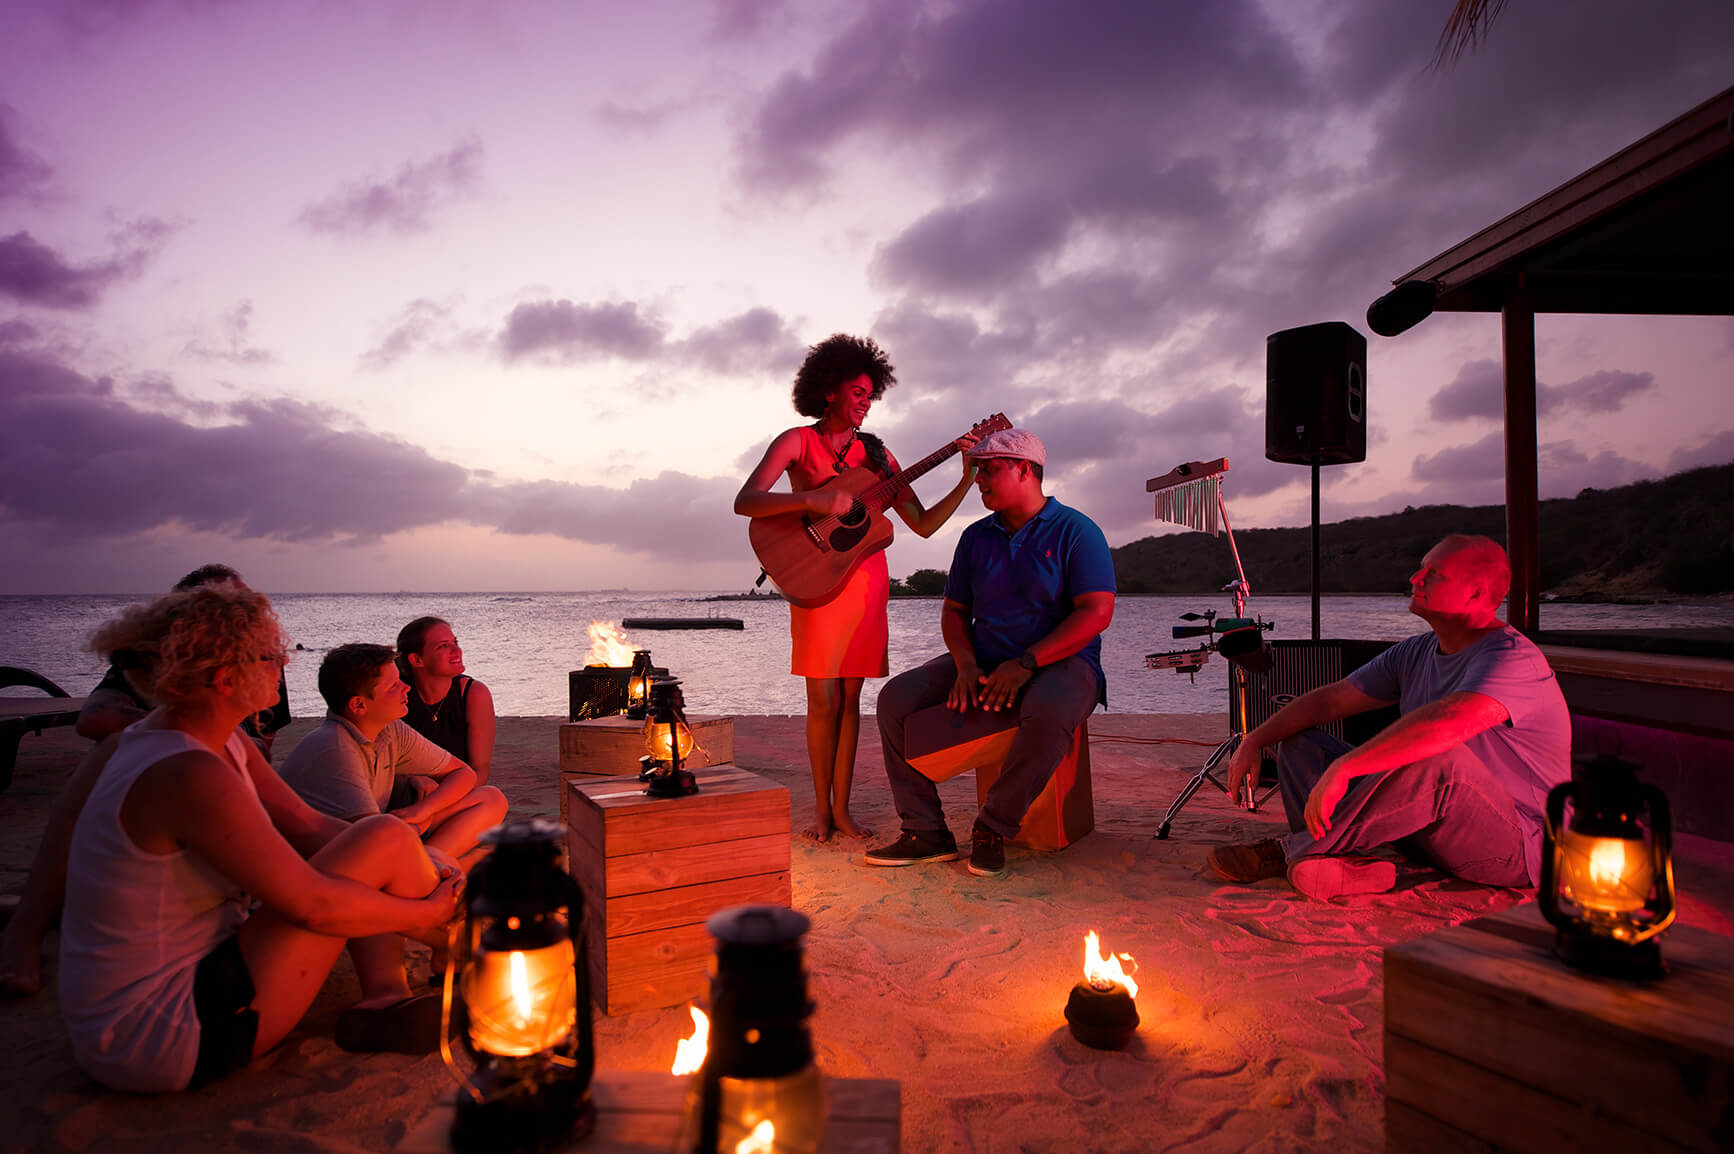 Visitors enjoying a night at Zanzibar's popular happy hour with live music.